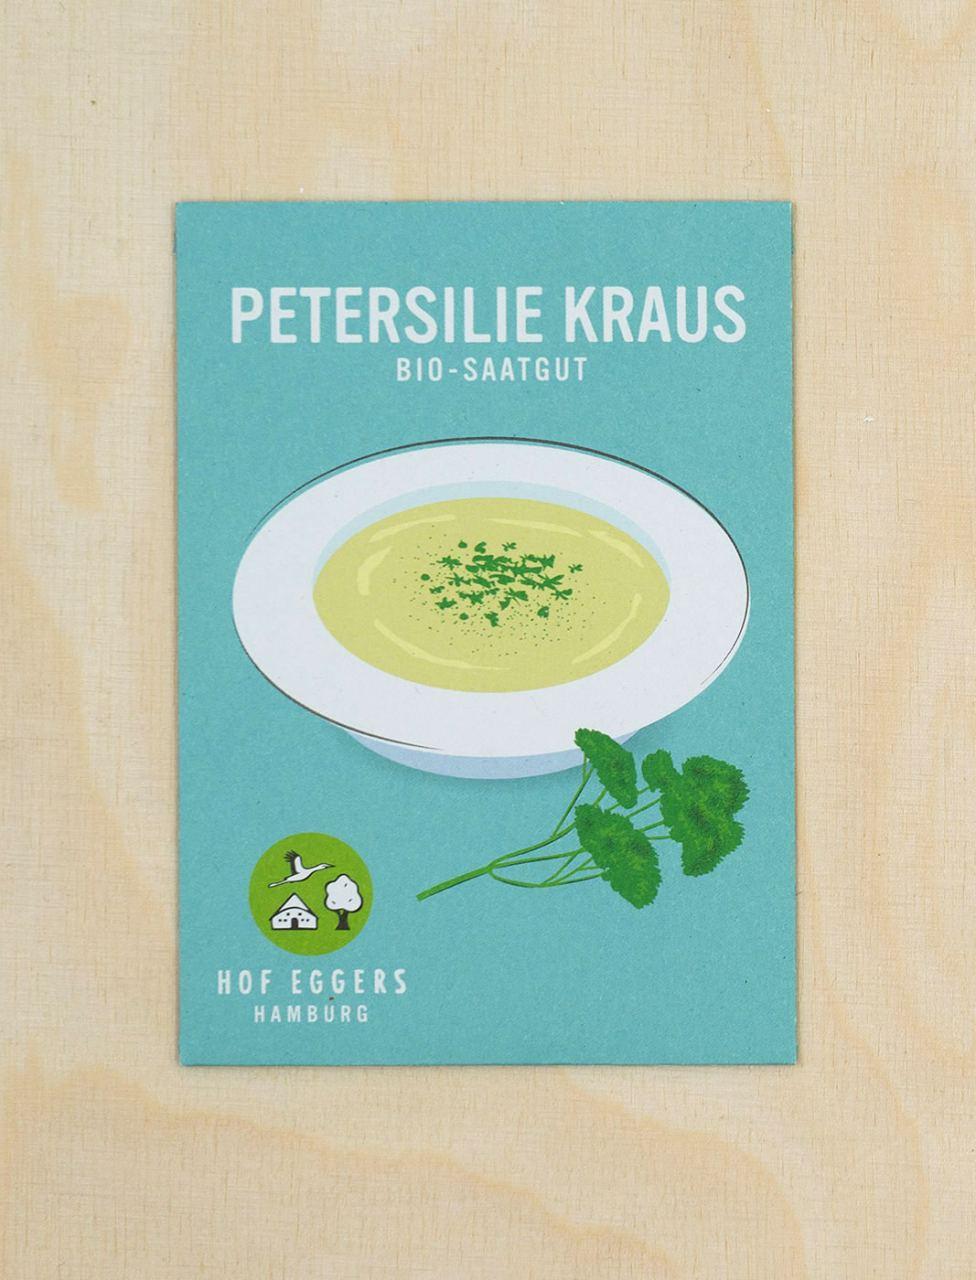 Petersilie Kraus, Bio-Saatgut